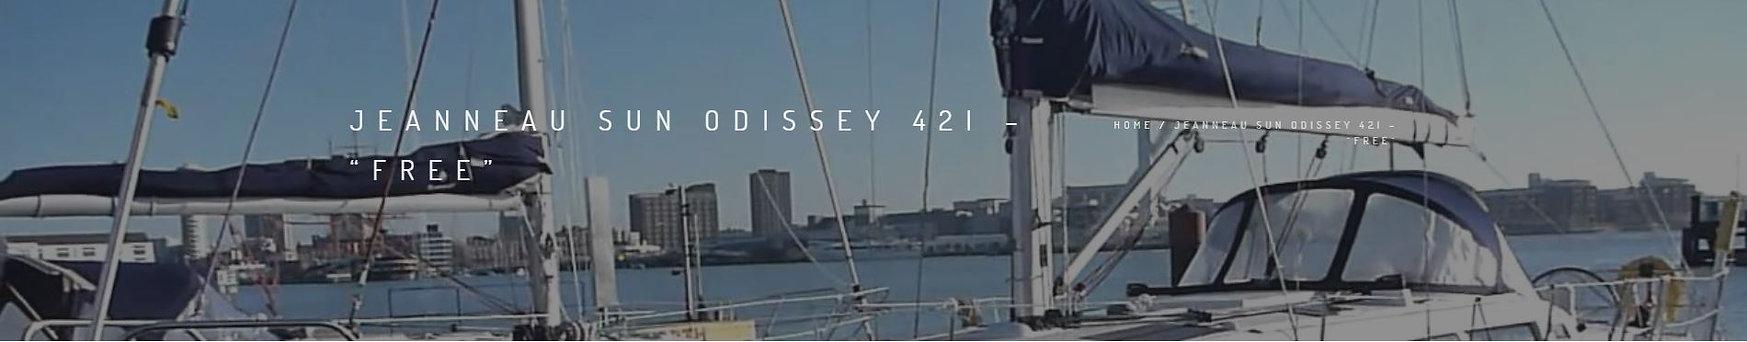 top_odissey_en.JPG